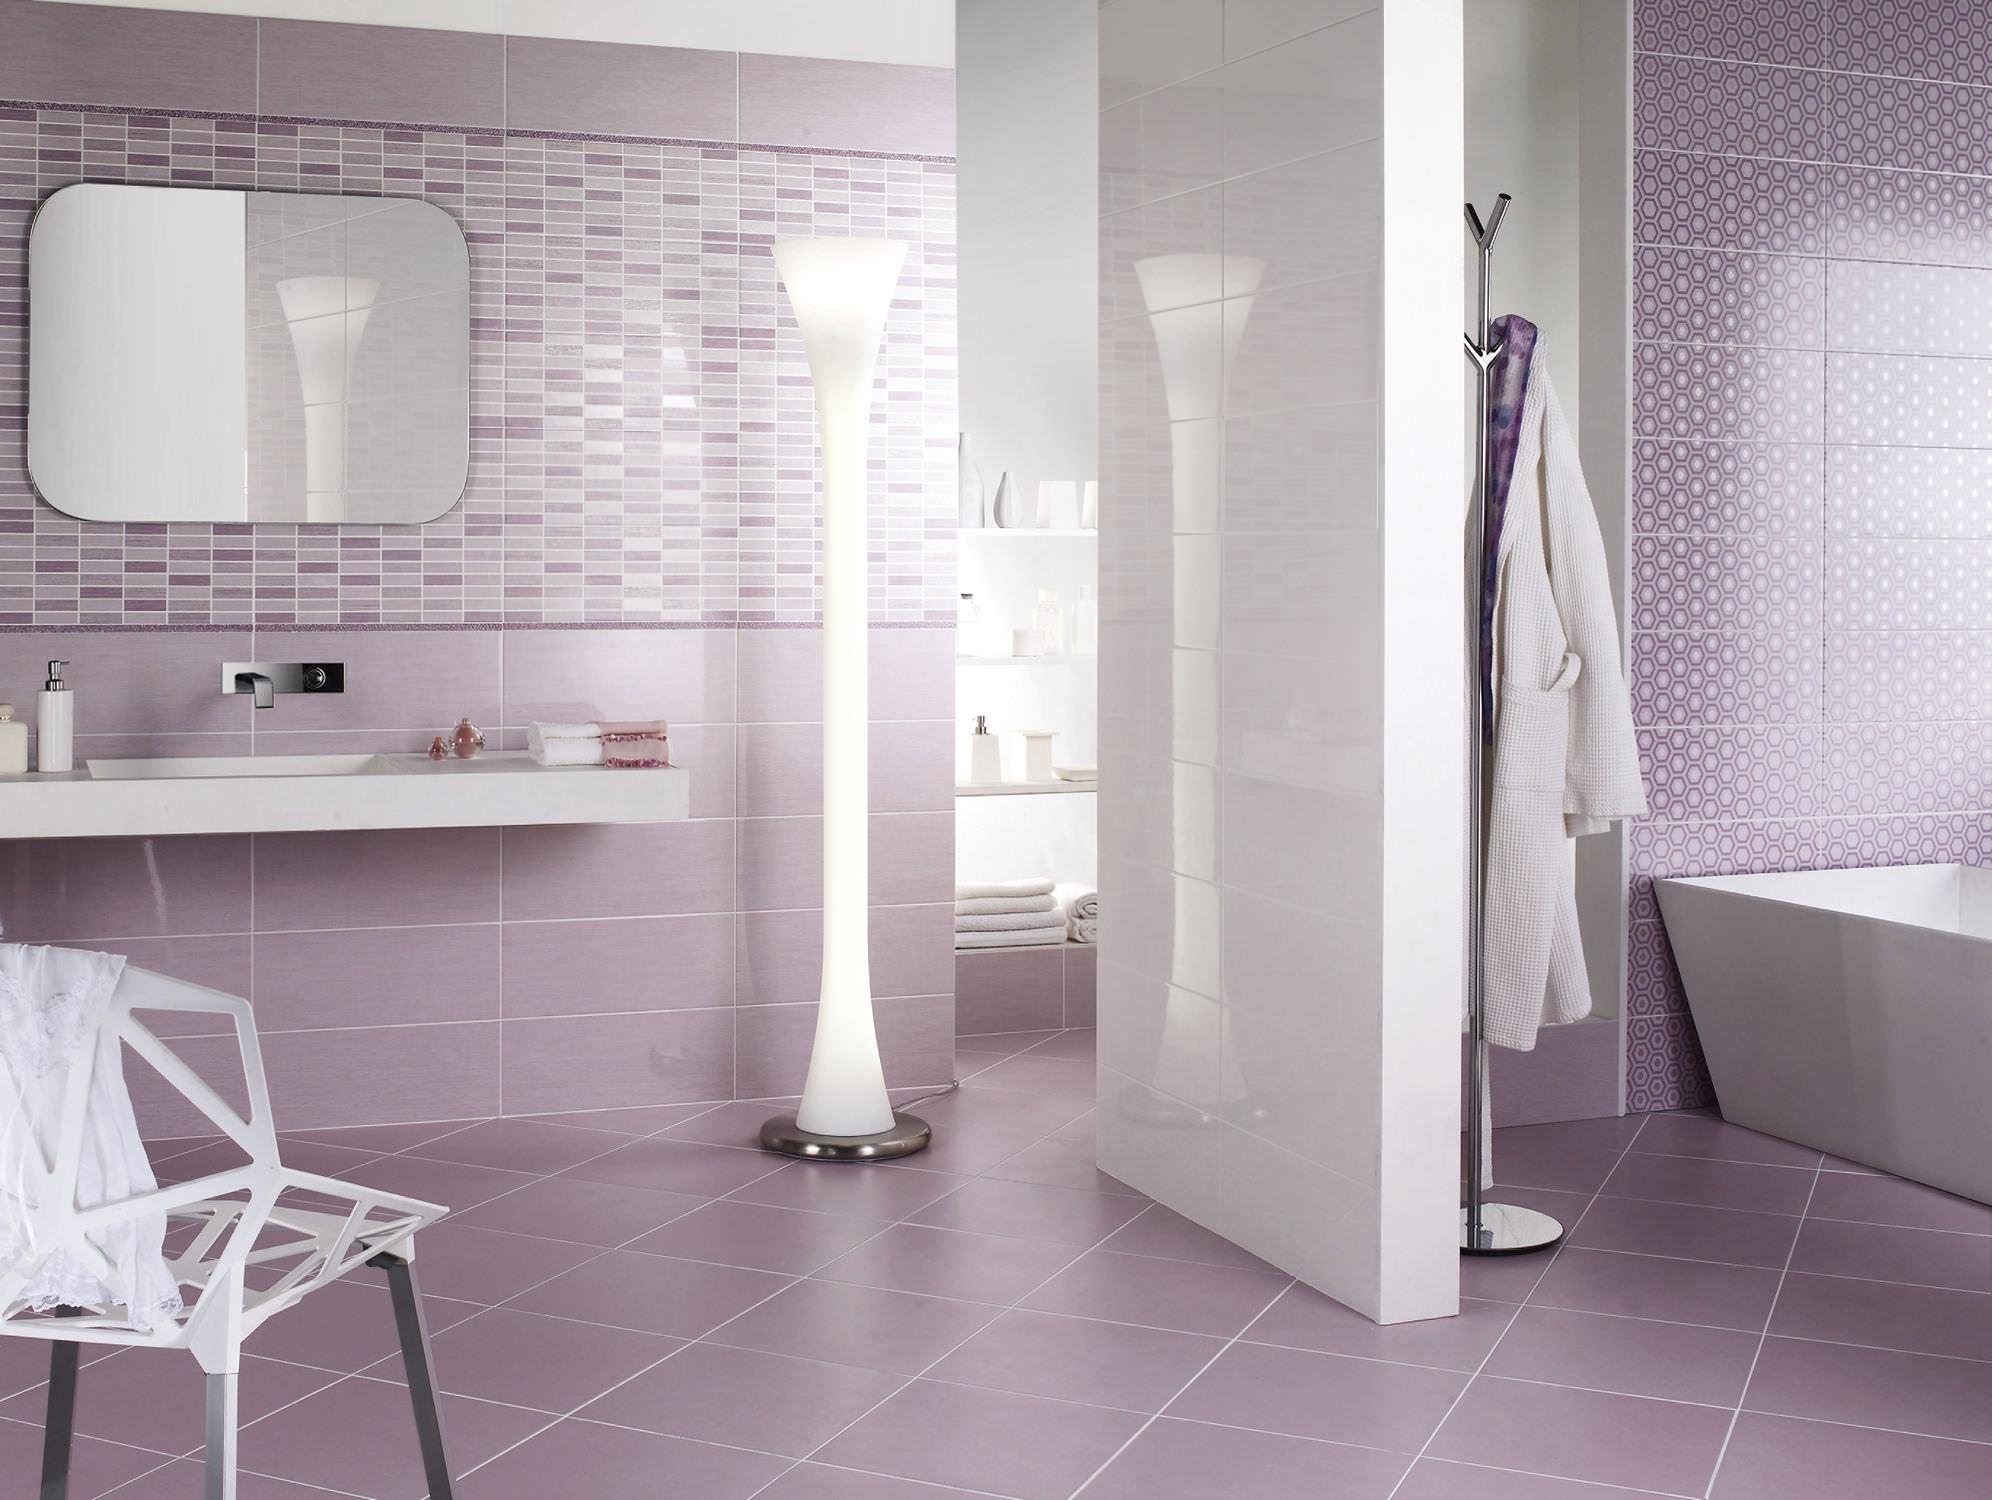 25 pictures of ceramic til for bathroom floors